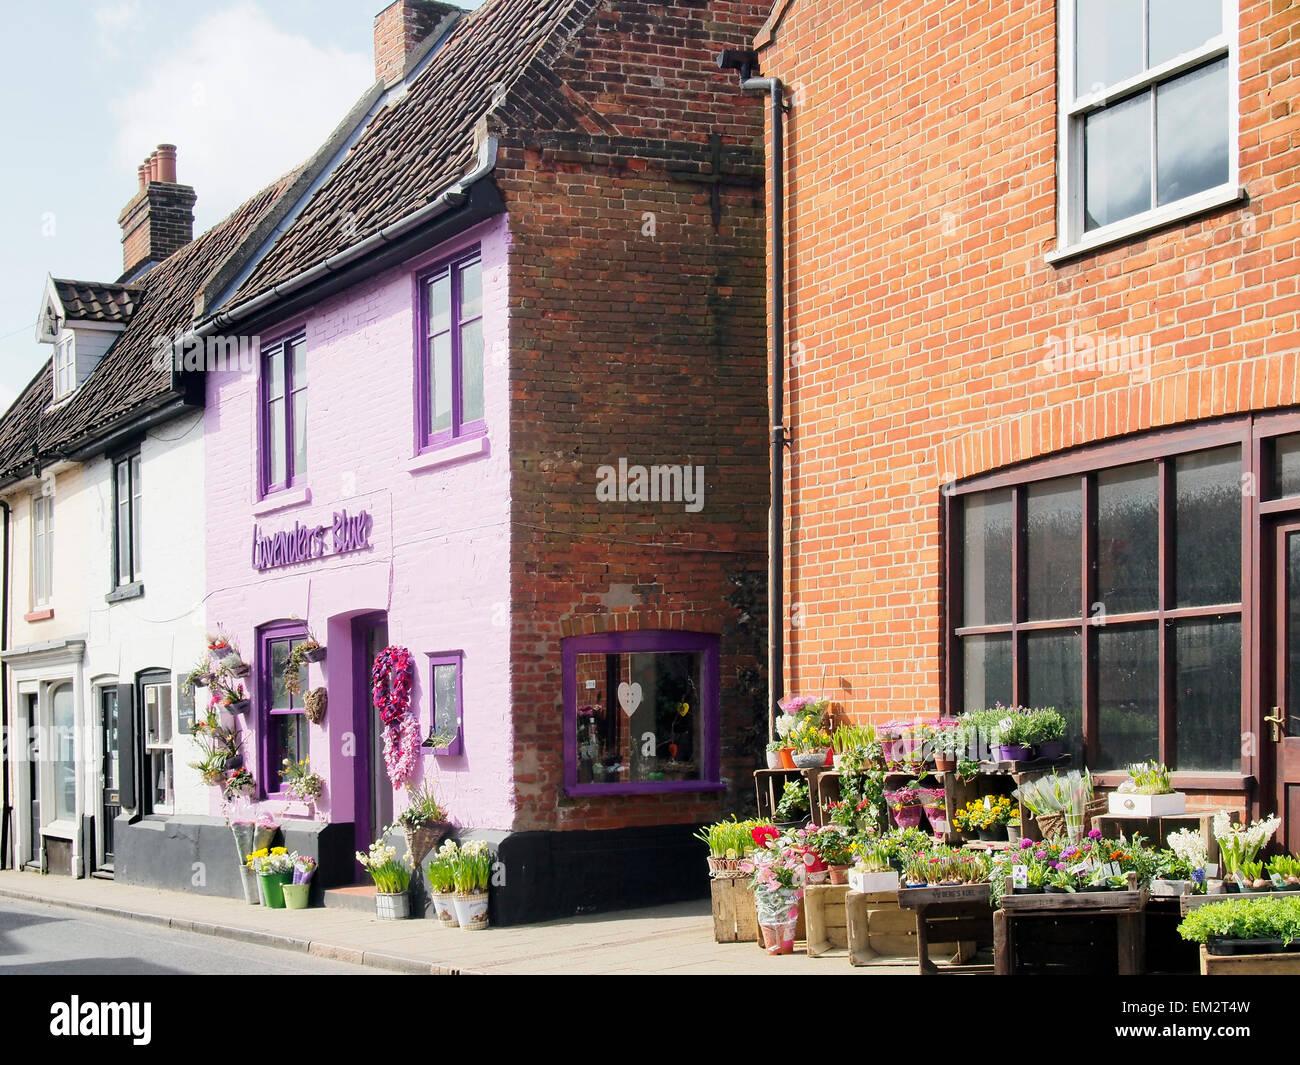 The vivid shop front of the Lavenders Blue florist shop in Red Lion Street, Aylsham, Norfolk - Stock Image